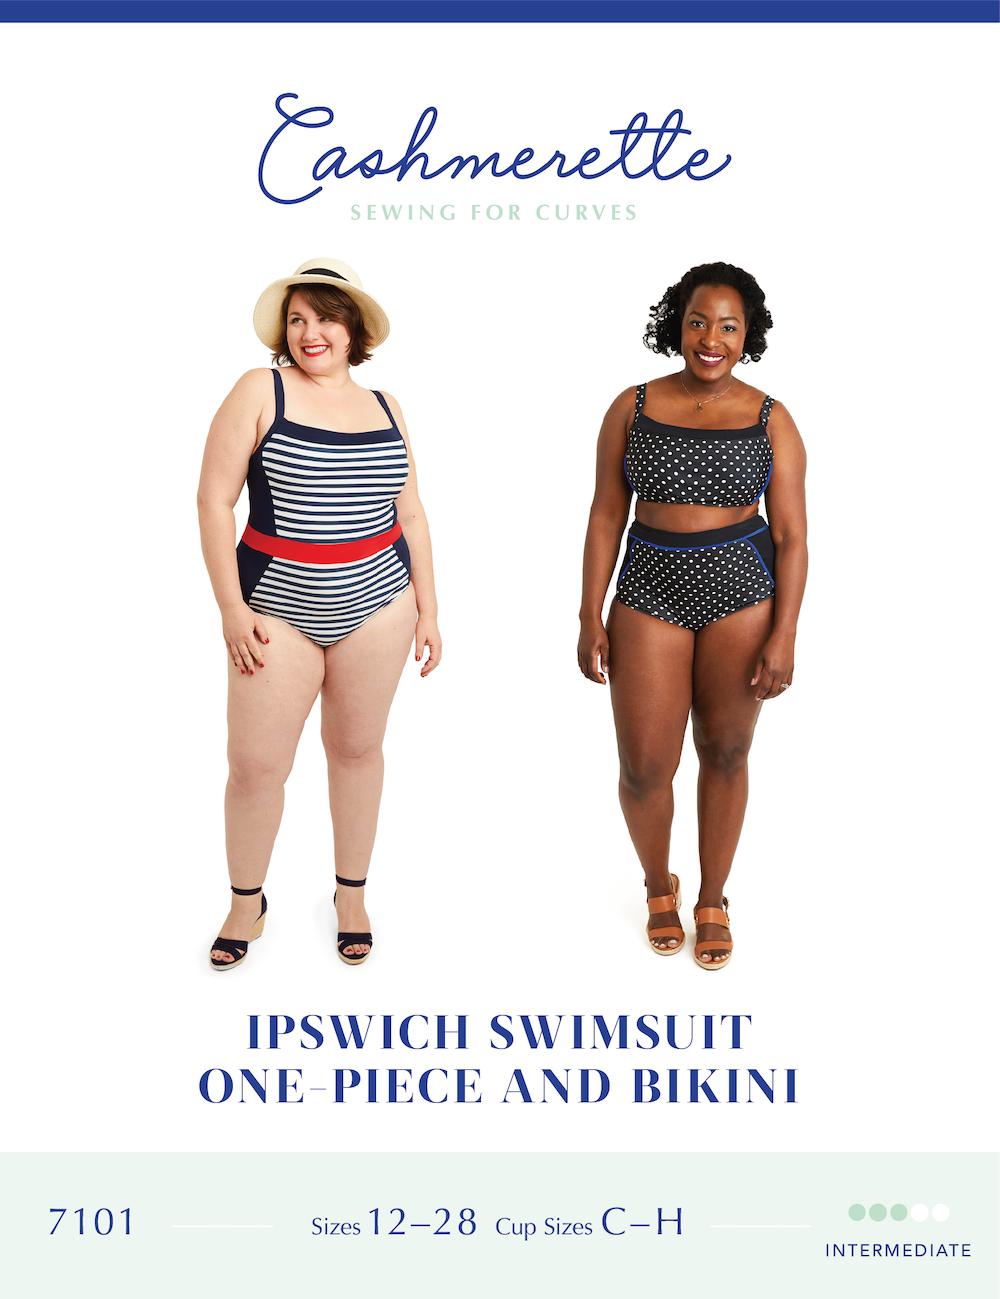 Ipswich Swimsuit - Cashmerette Patterns